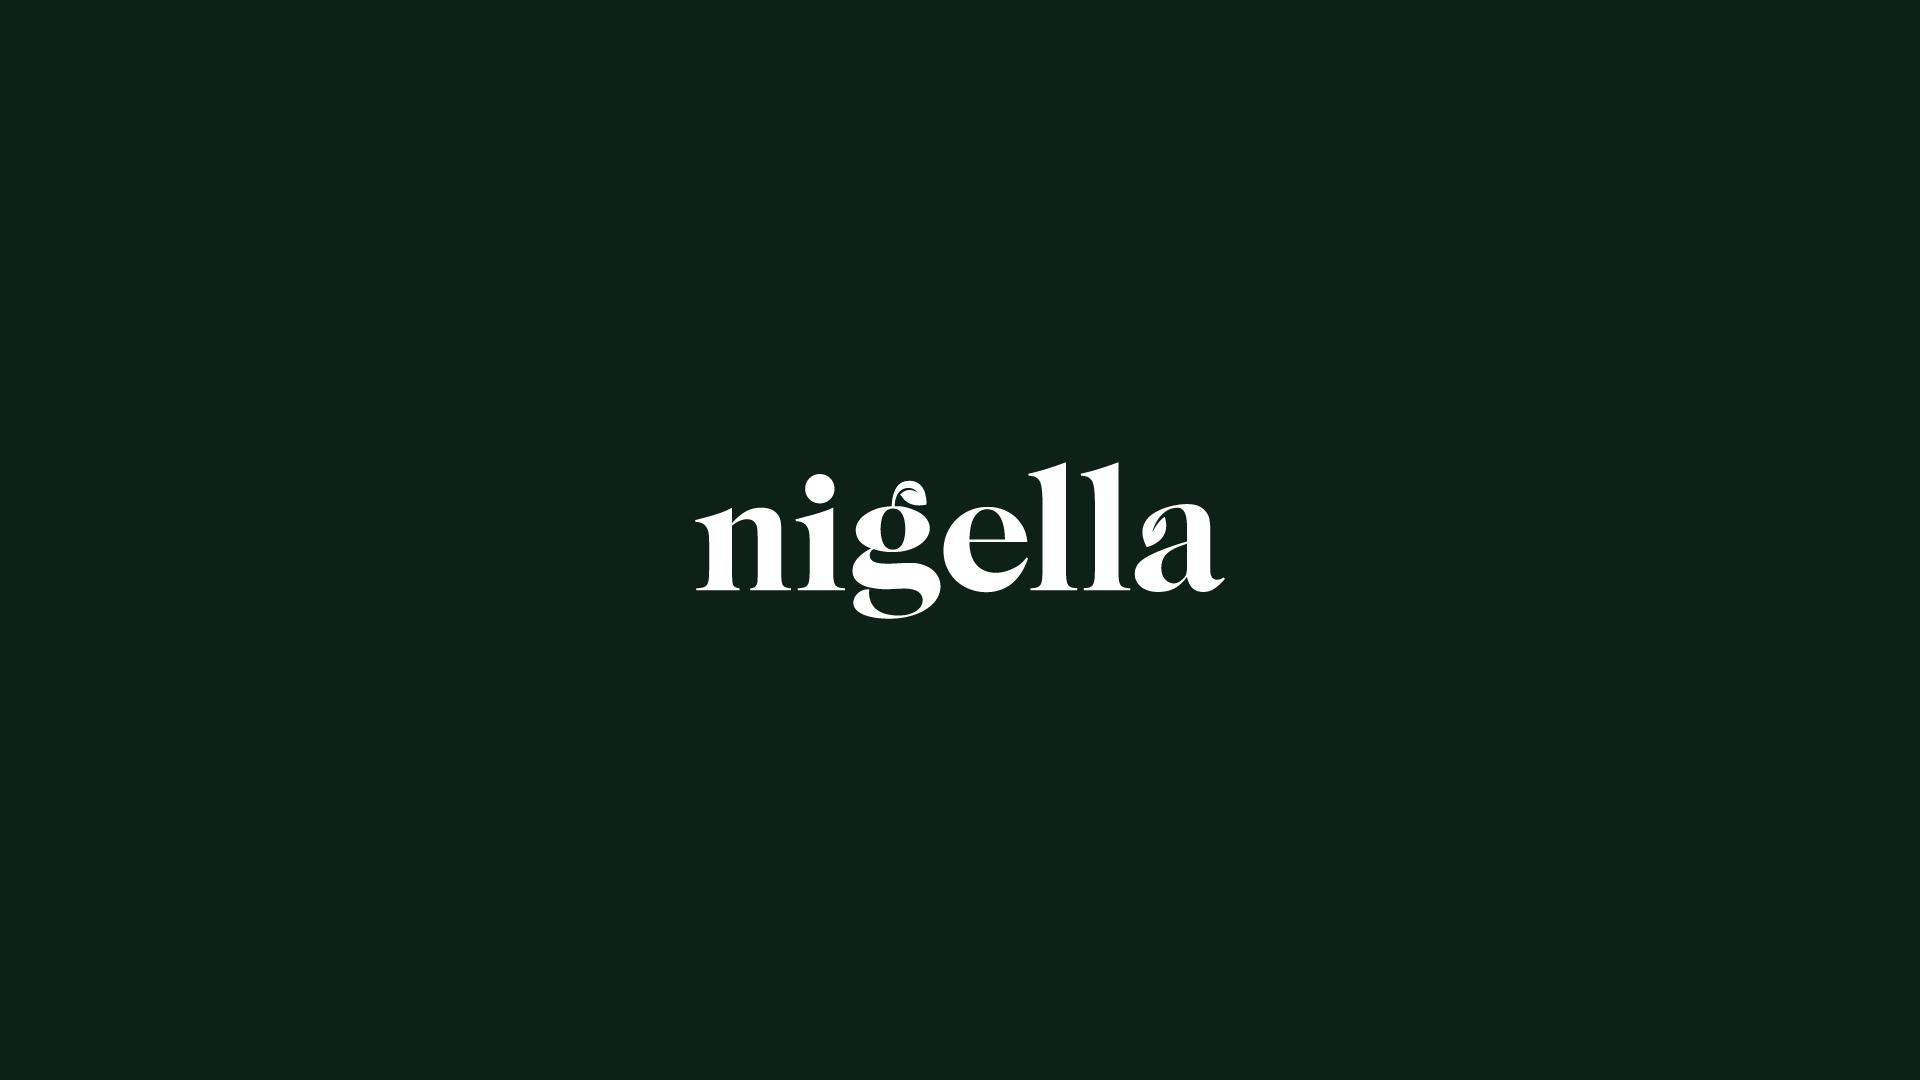 Anastasia-Itkina-Nigella-2.jpg